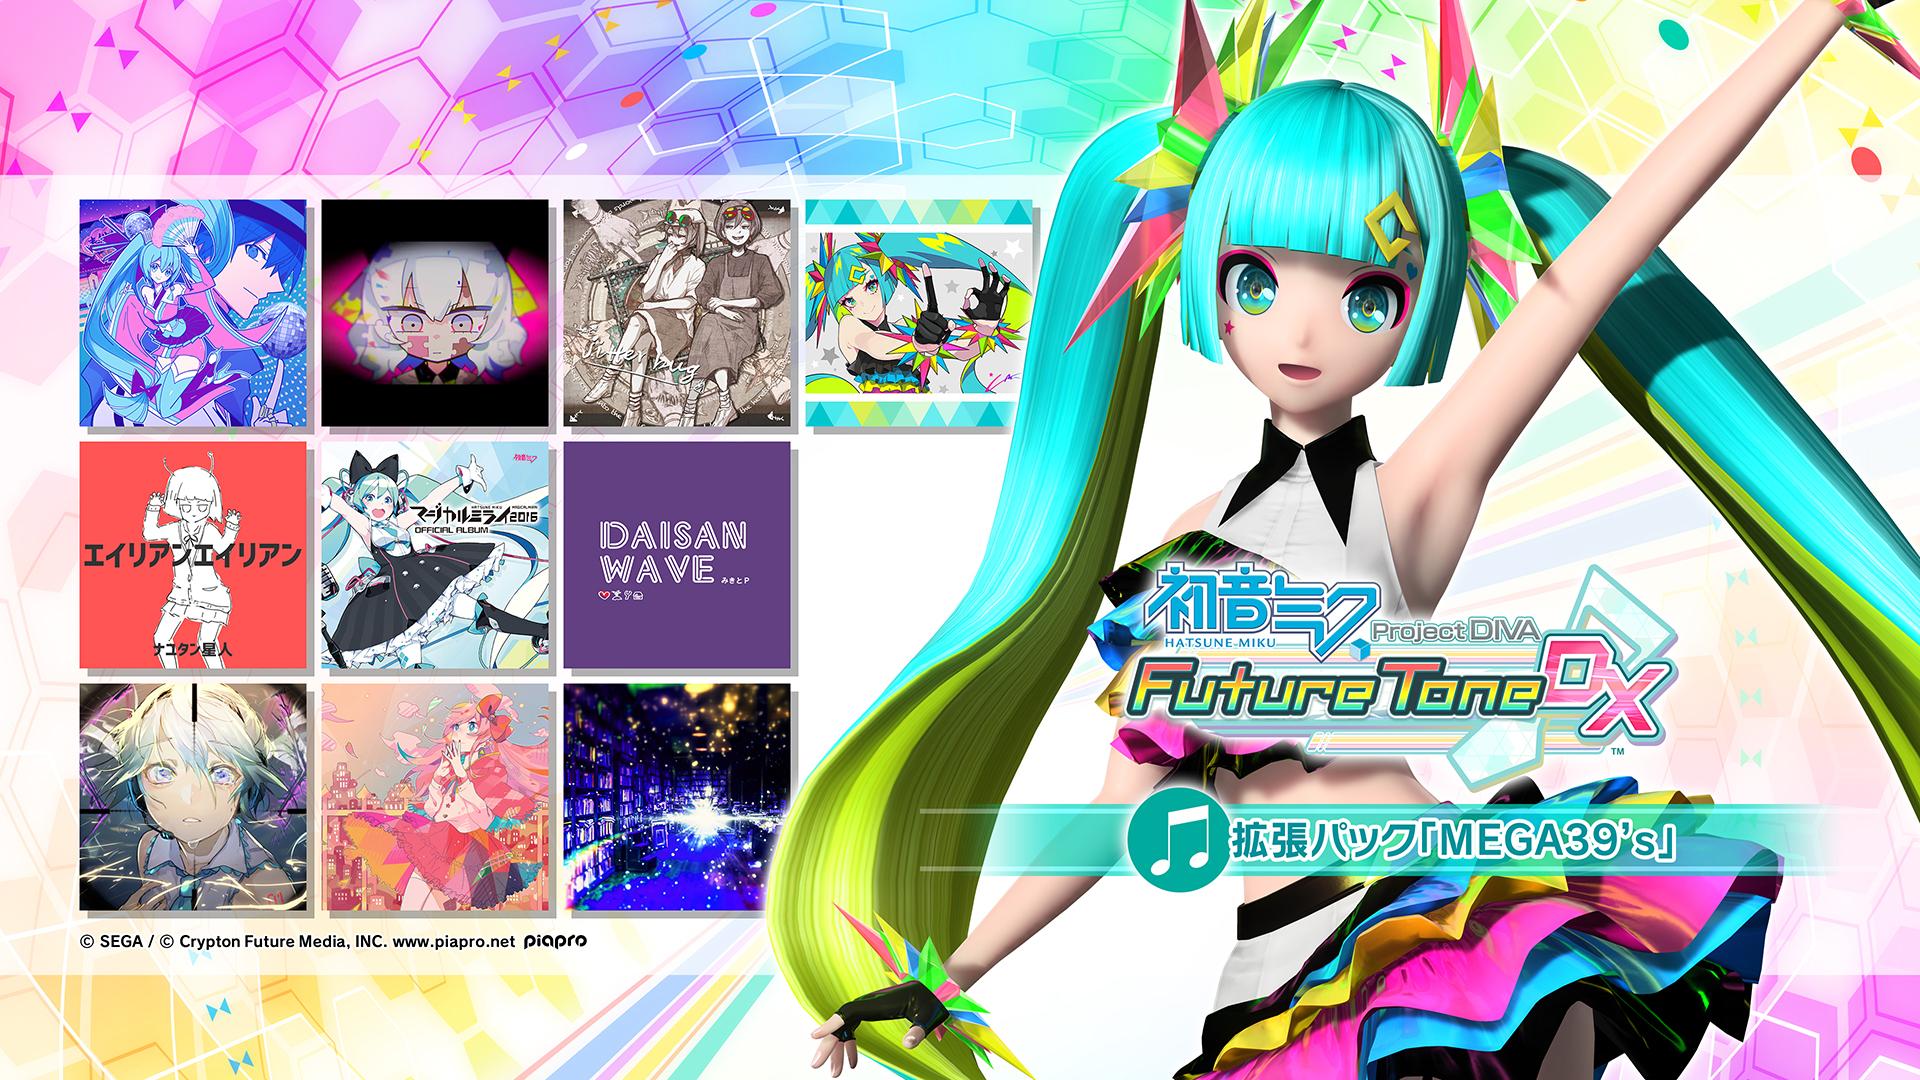 Sega Hatsune Miku Project DIVA Arcade Future Tone SD Figure Megurine Luka SG3357